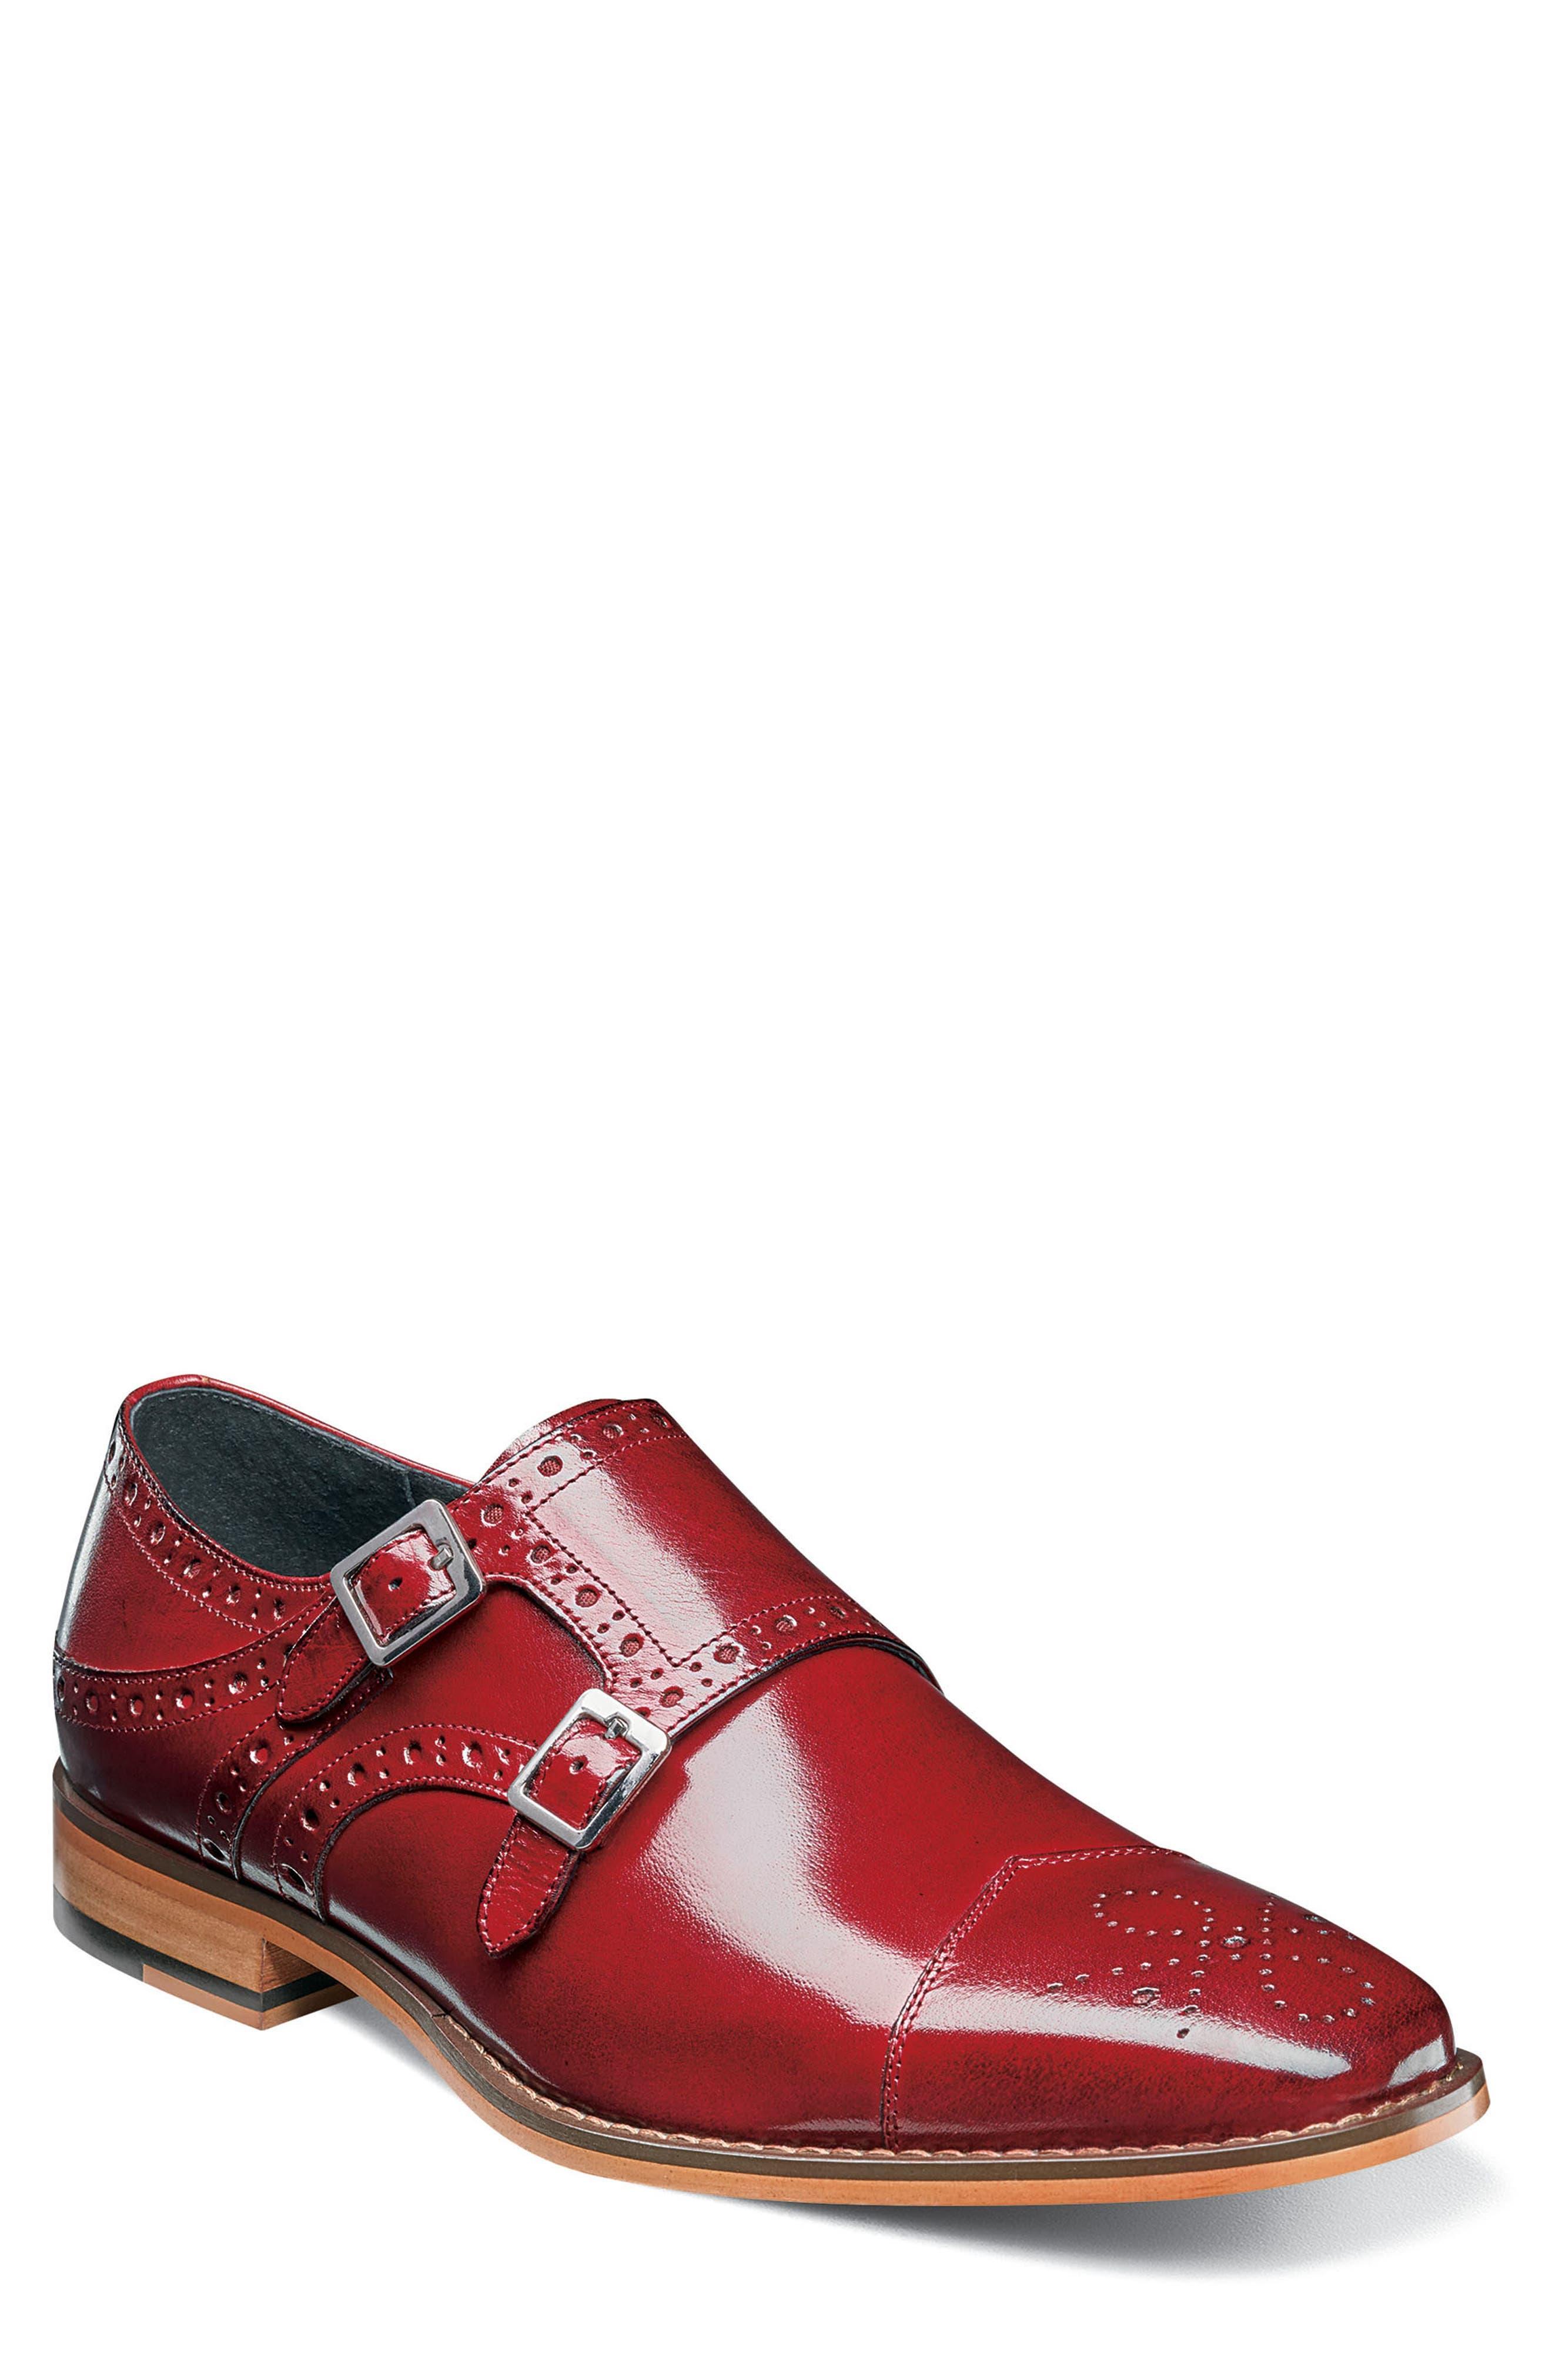 Tayton Cap Toe Double Strap Monk Shoe,                         Main,                         color, RED LEATHER